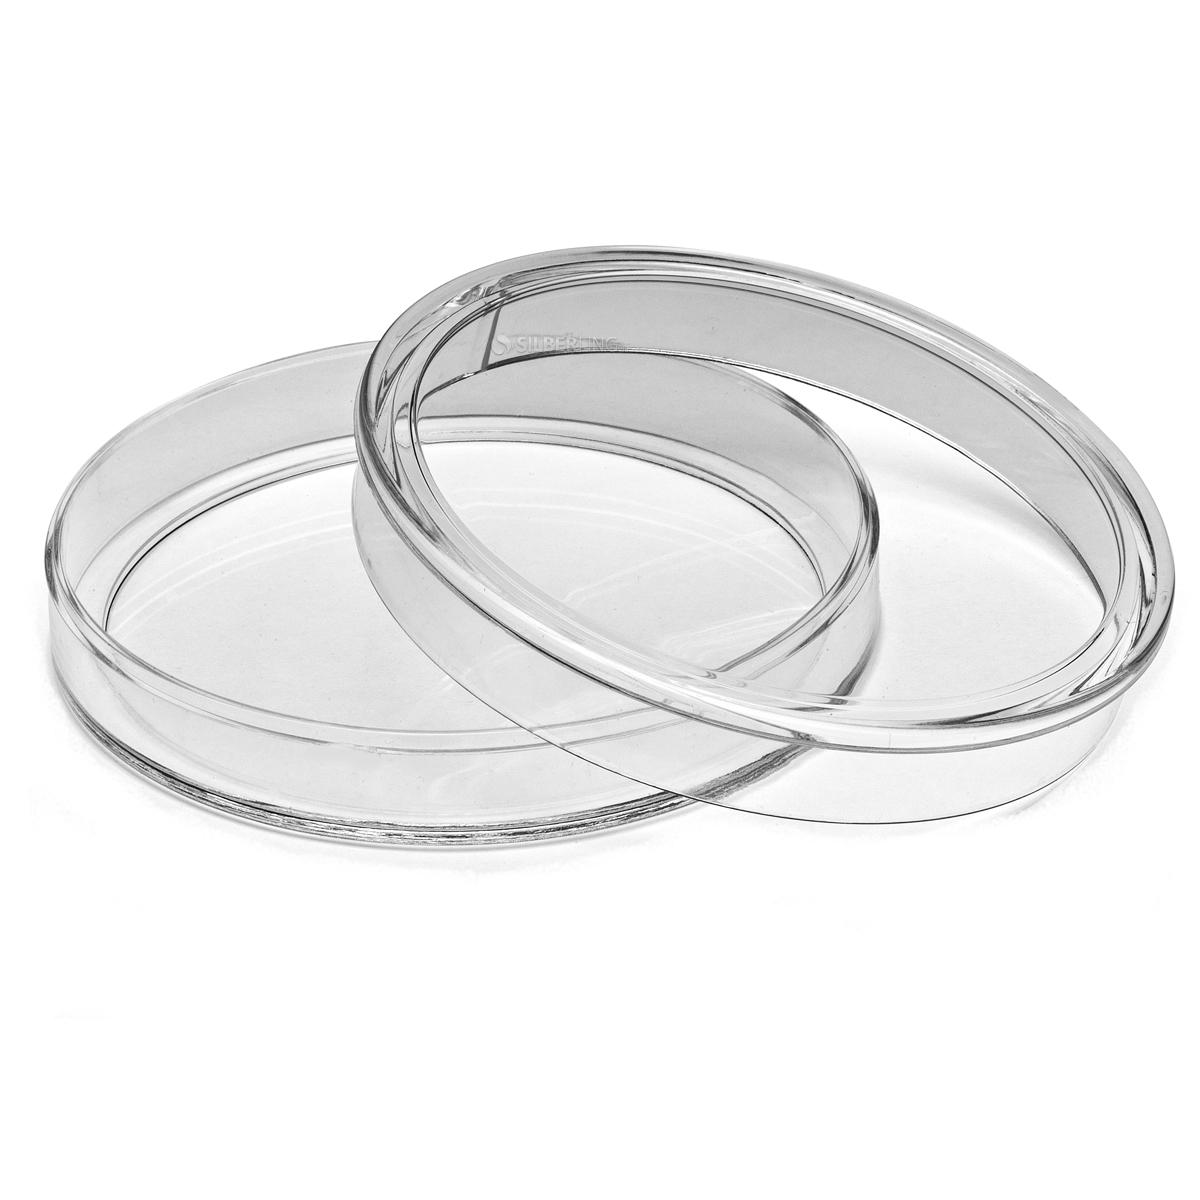 Münzkapsel 15 Oz Silber Online Kaufen Silberlingde